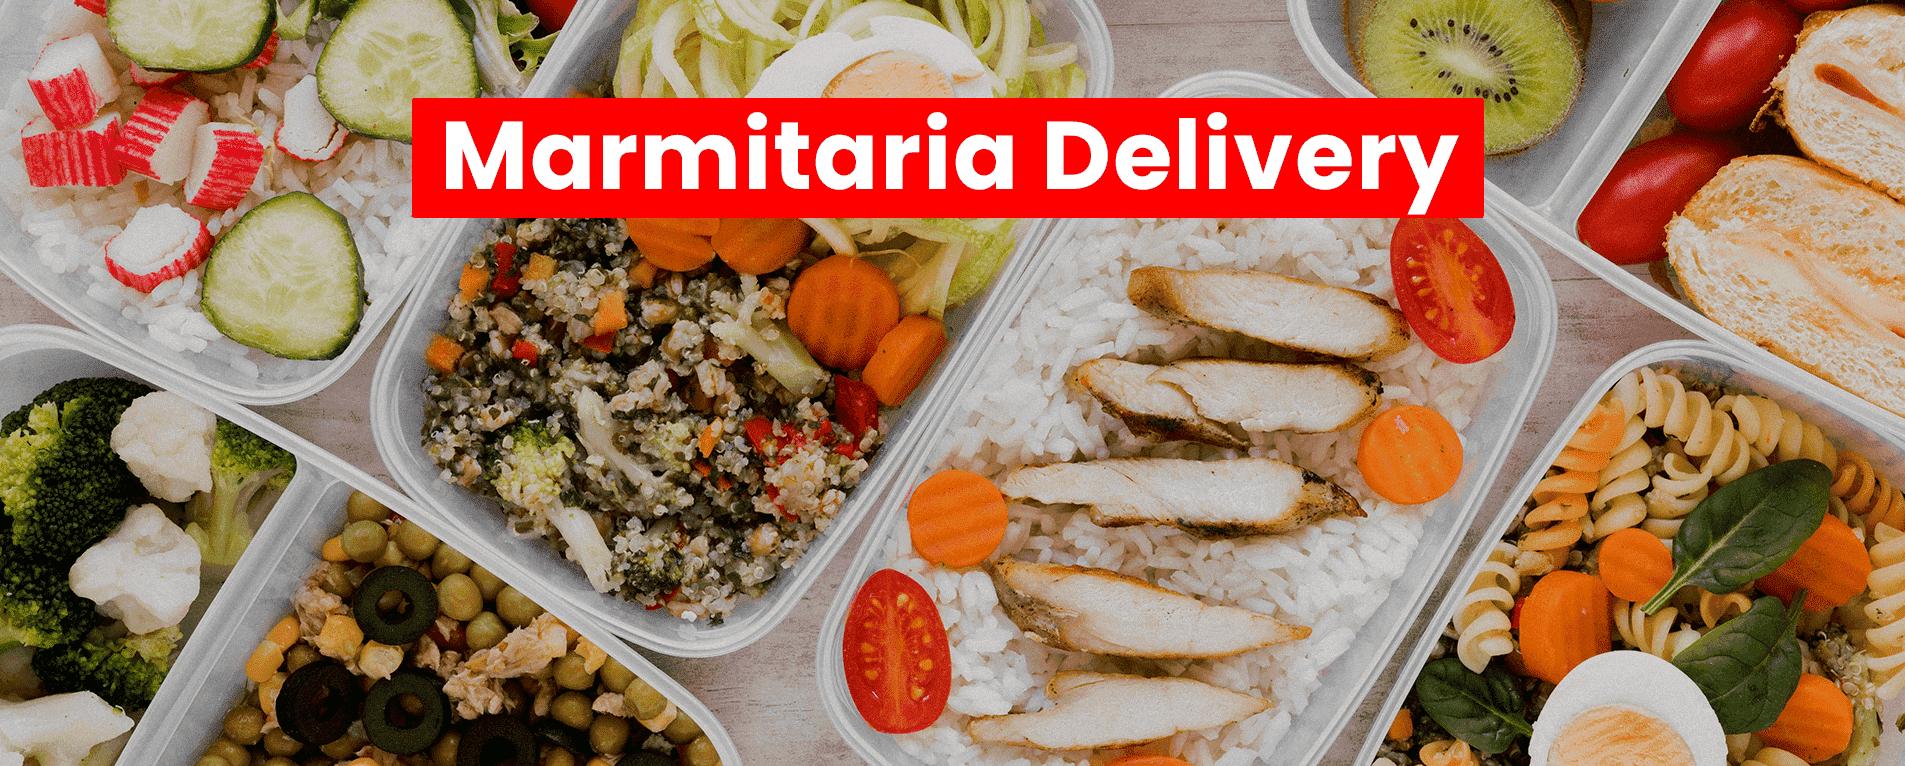 10 Dicas para sua Marmitaria Delivery Impulsionar as Vendas